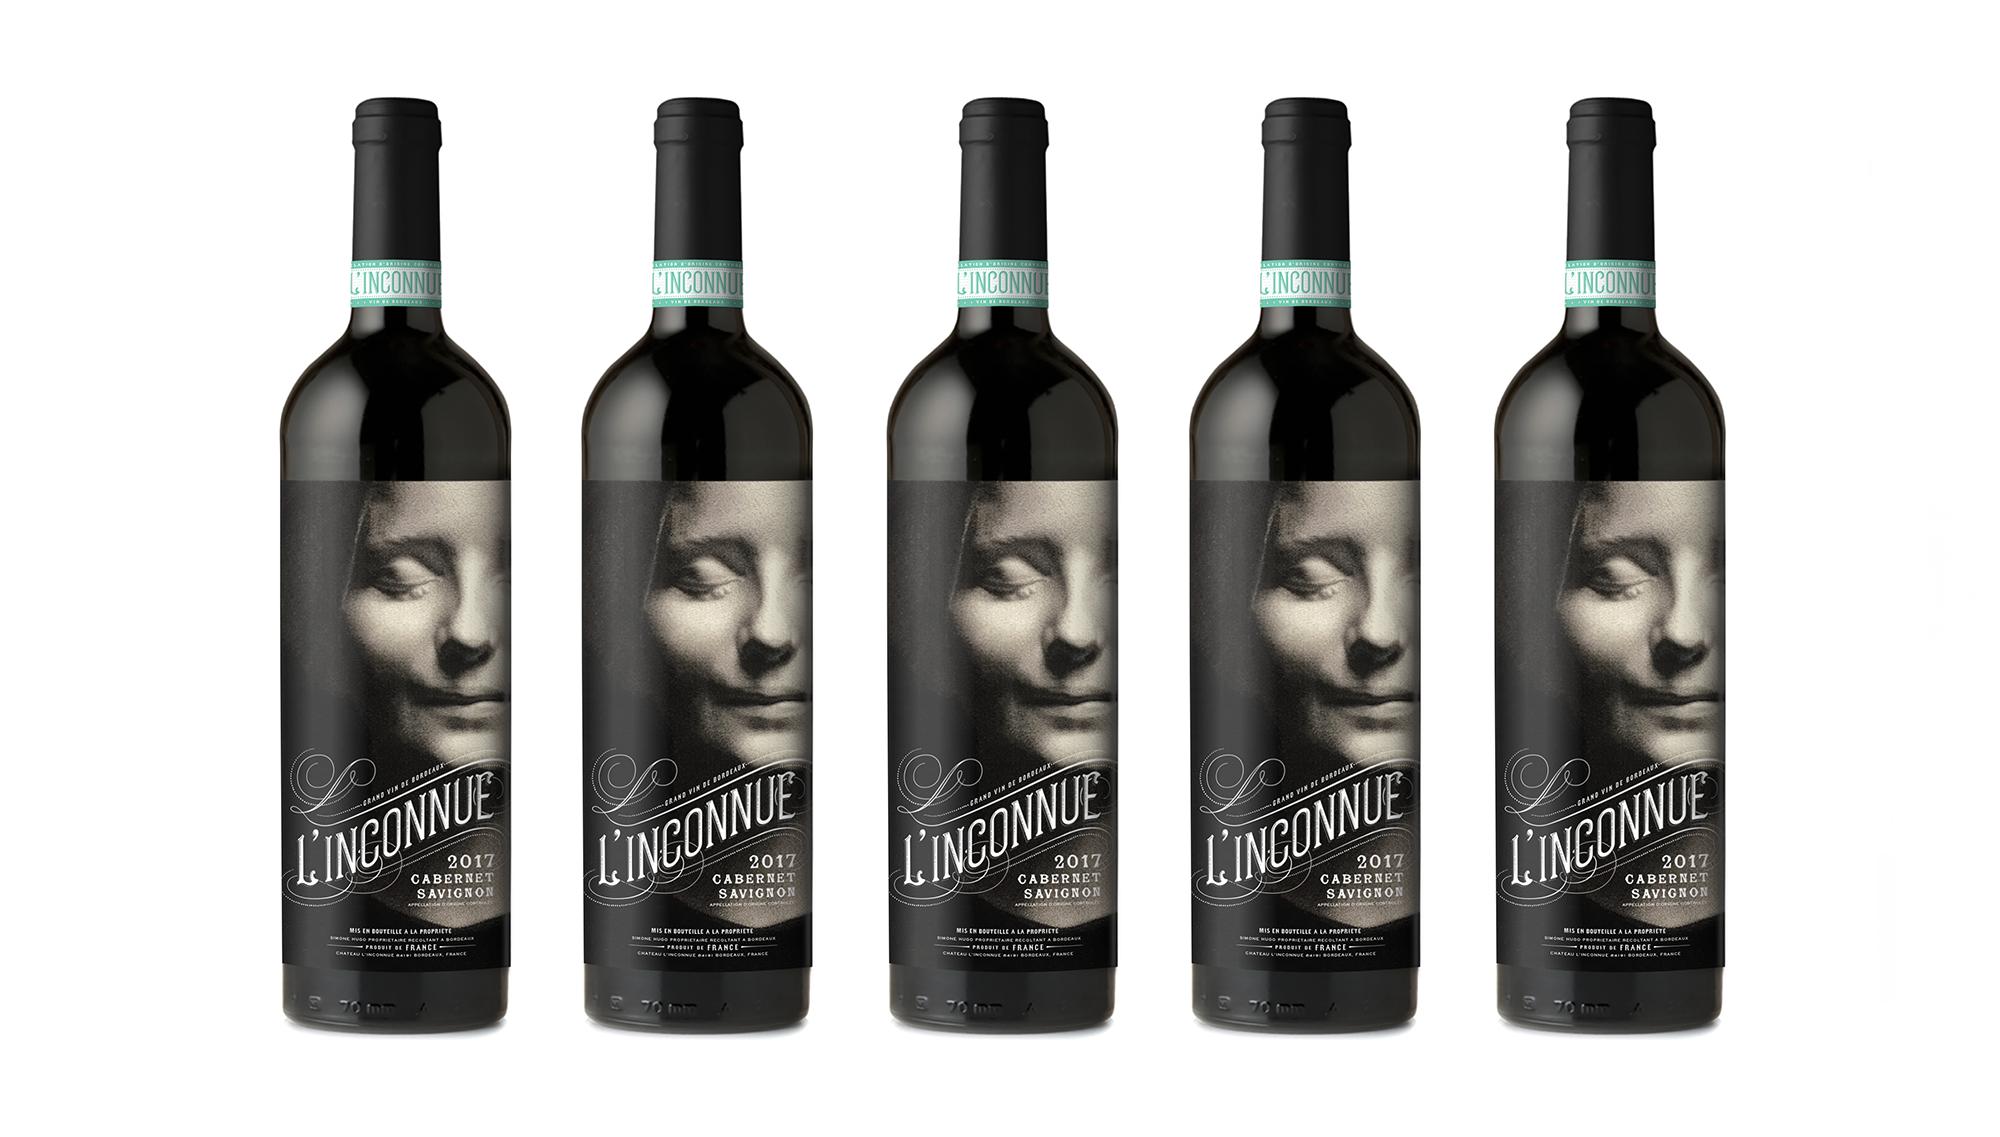 L'inconnue Wine bottle design